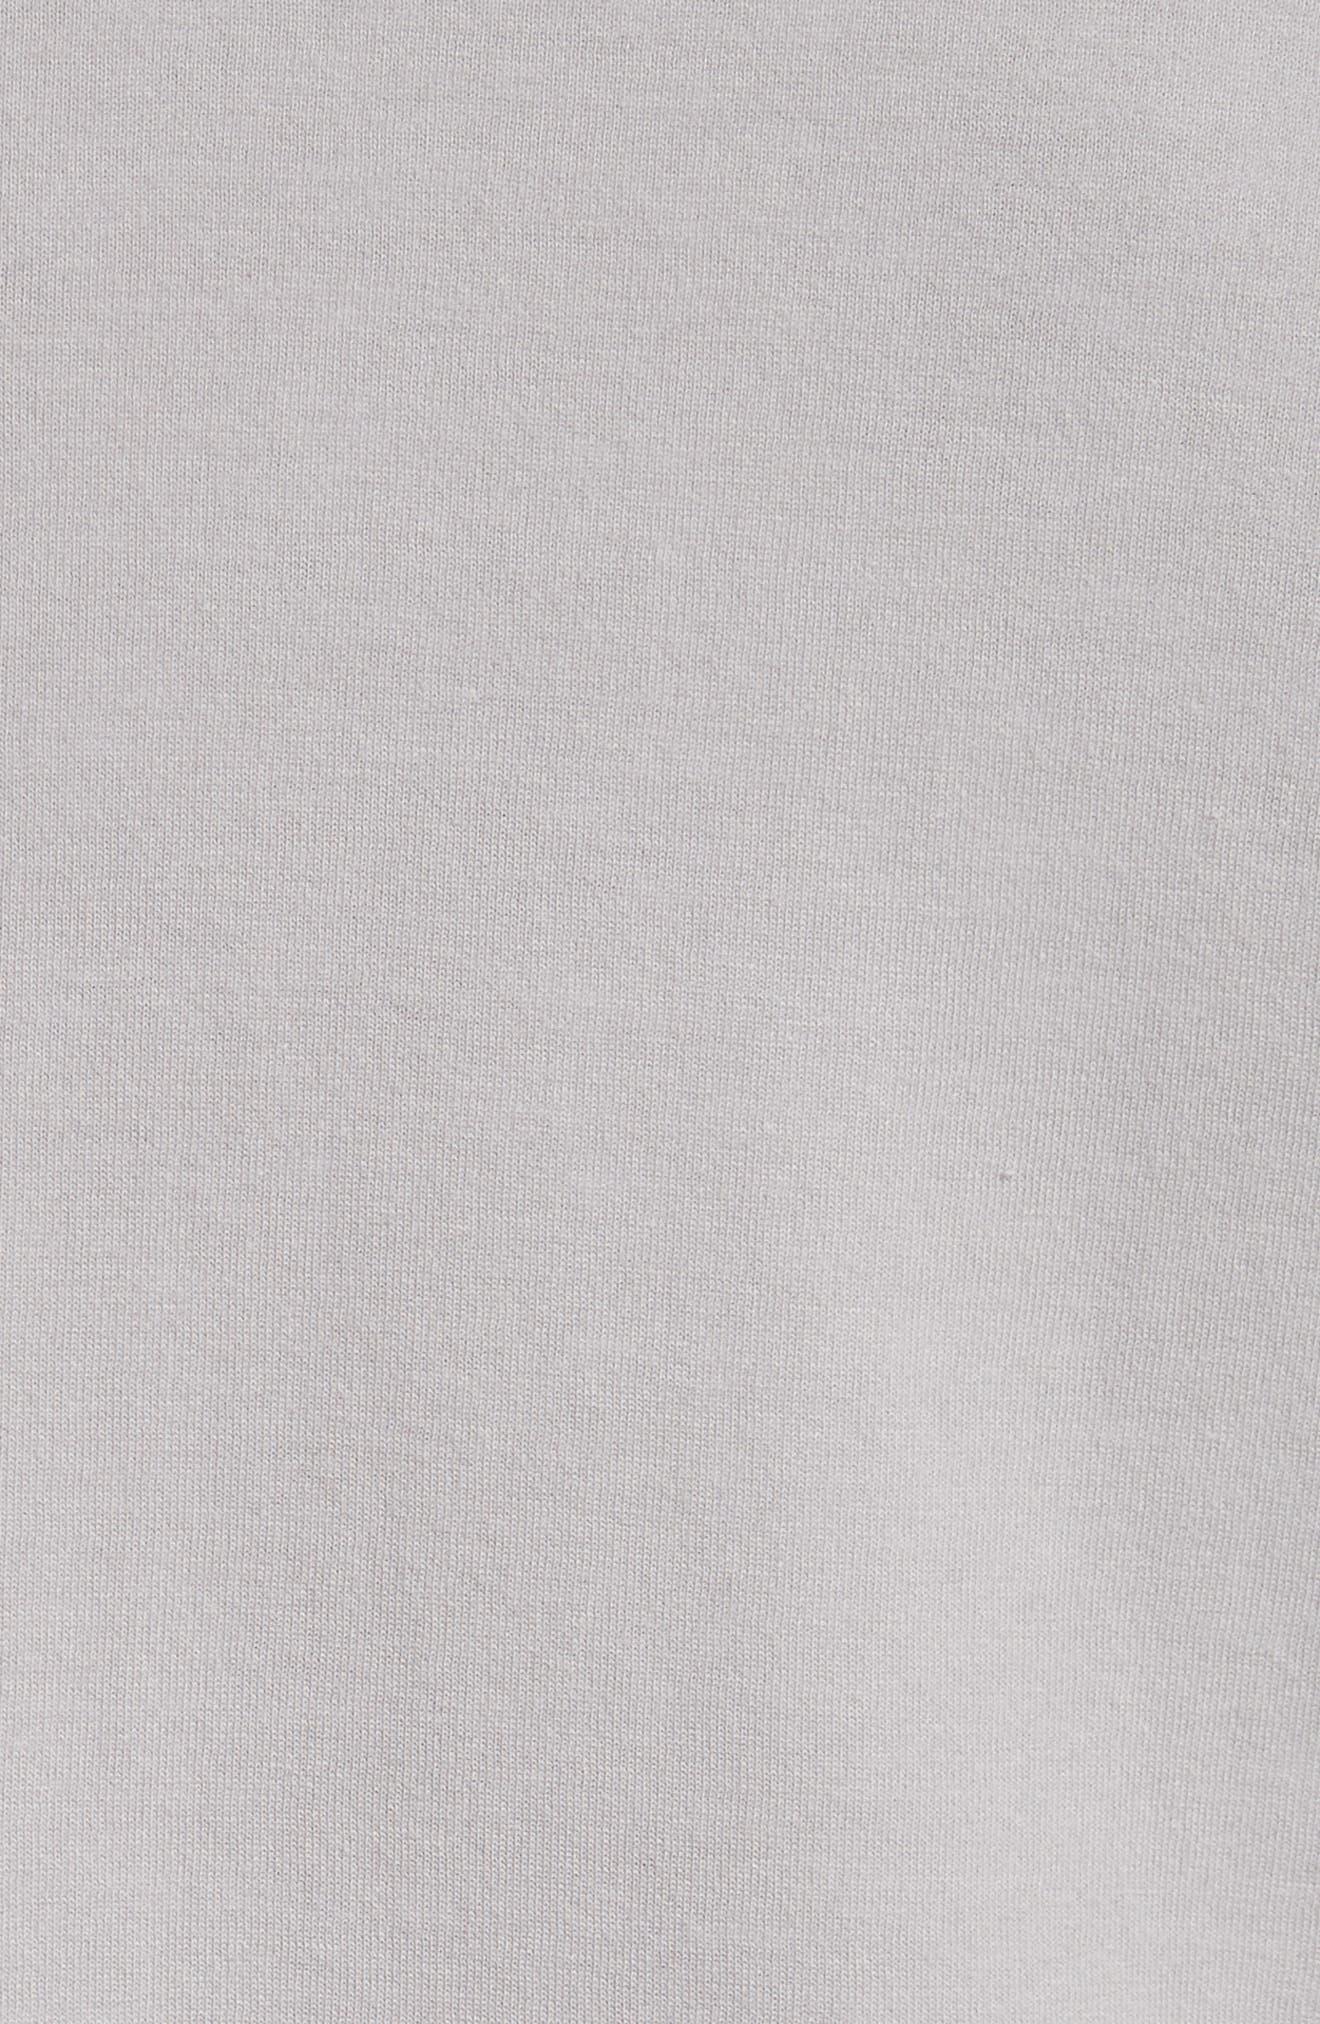 Long Sleeve T-Shirt,                             Alternate thumbnail 5, color,                             Grey